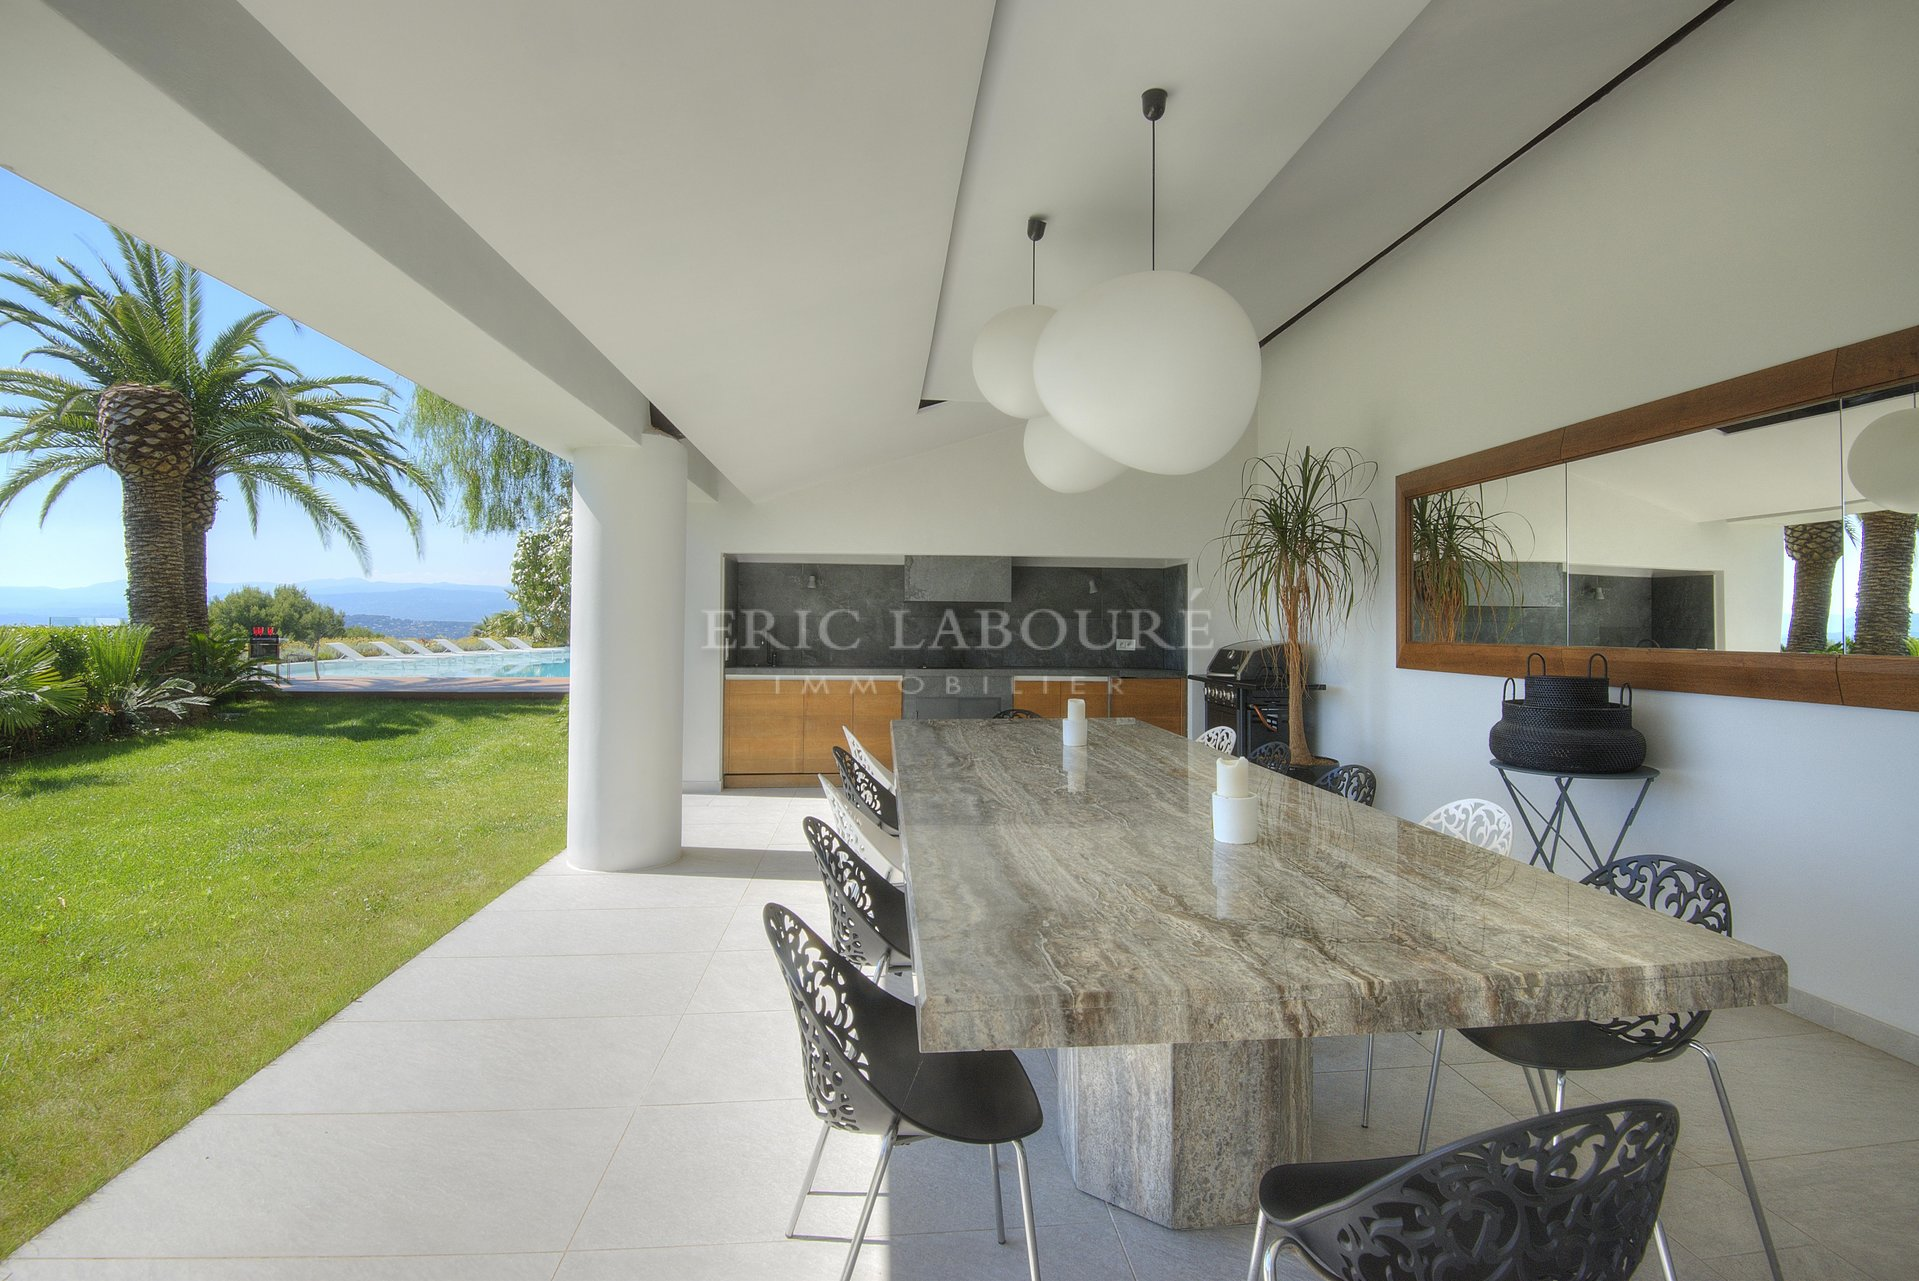 Kitchen bar, high ceiling